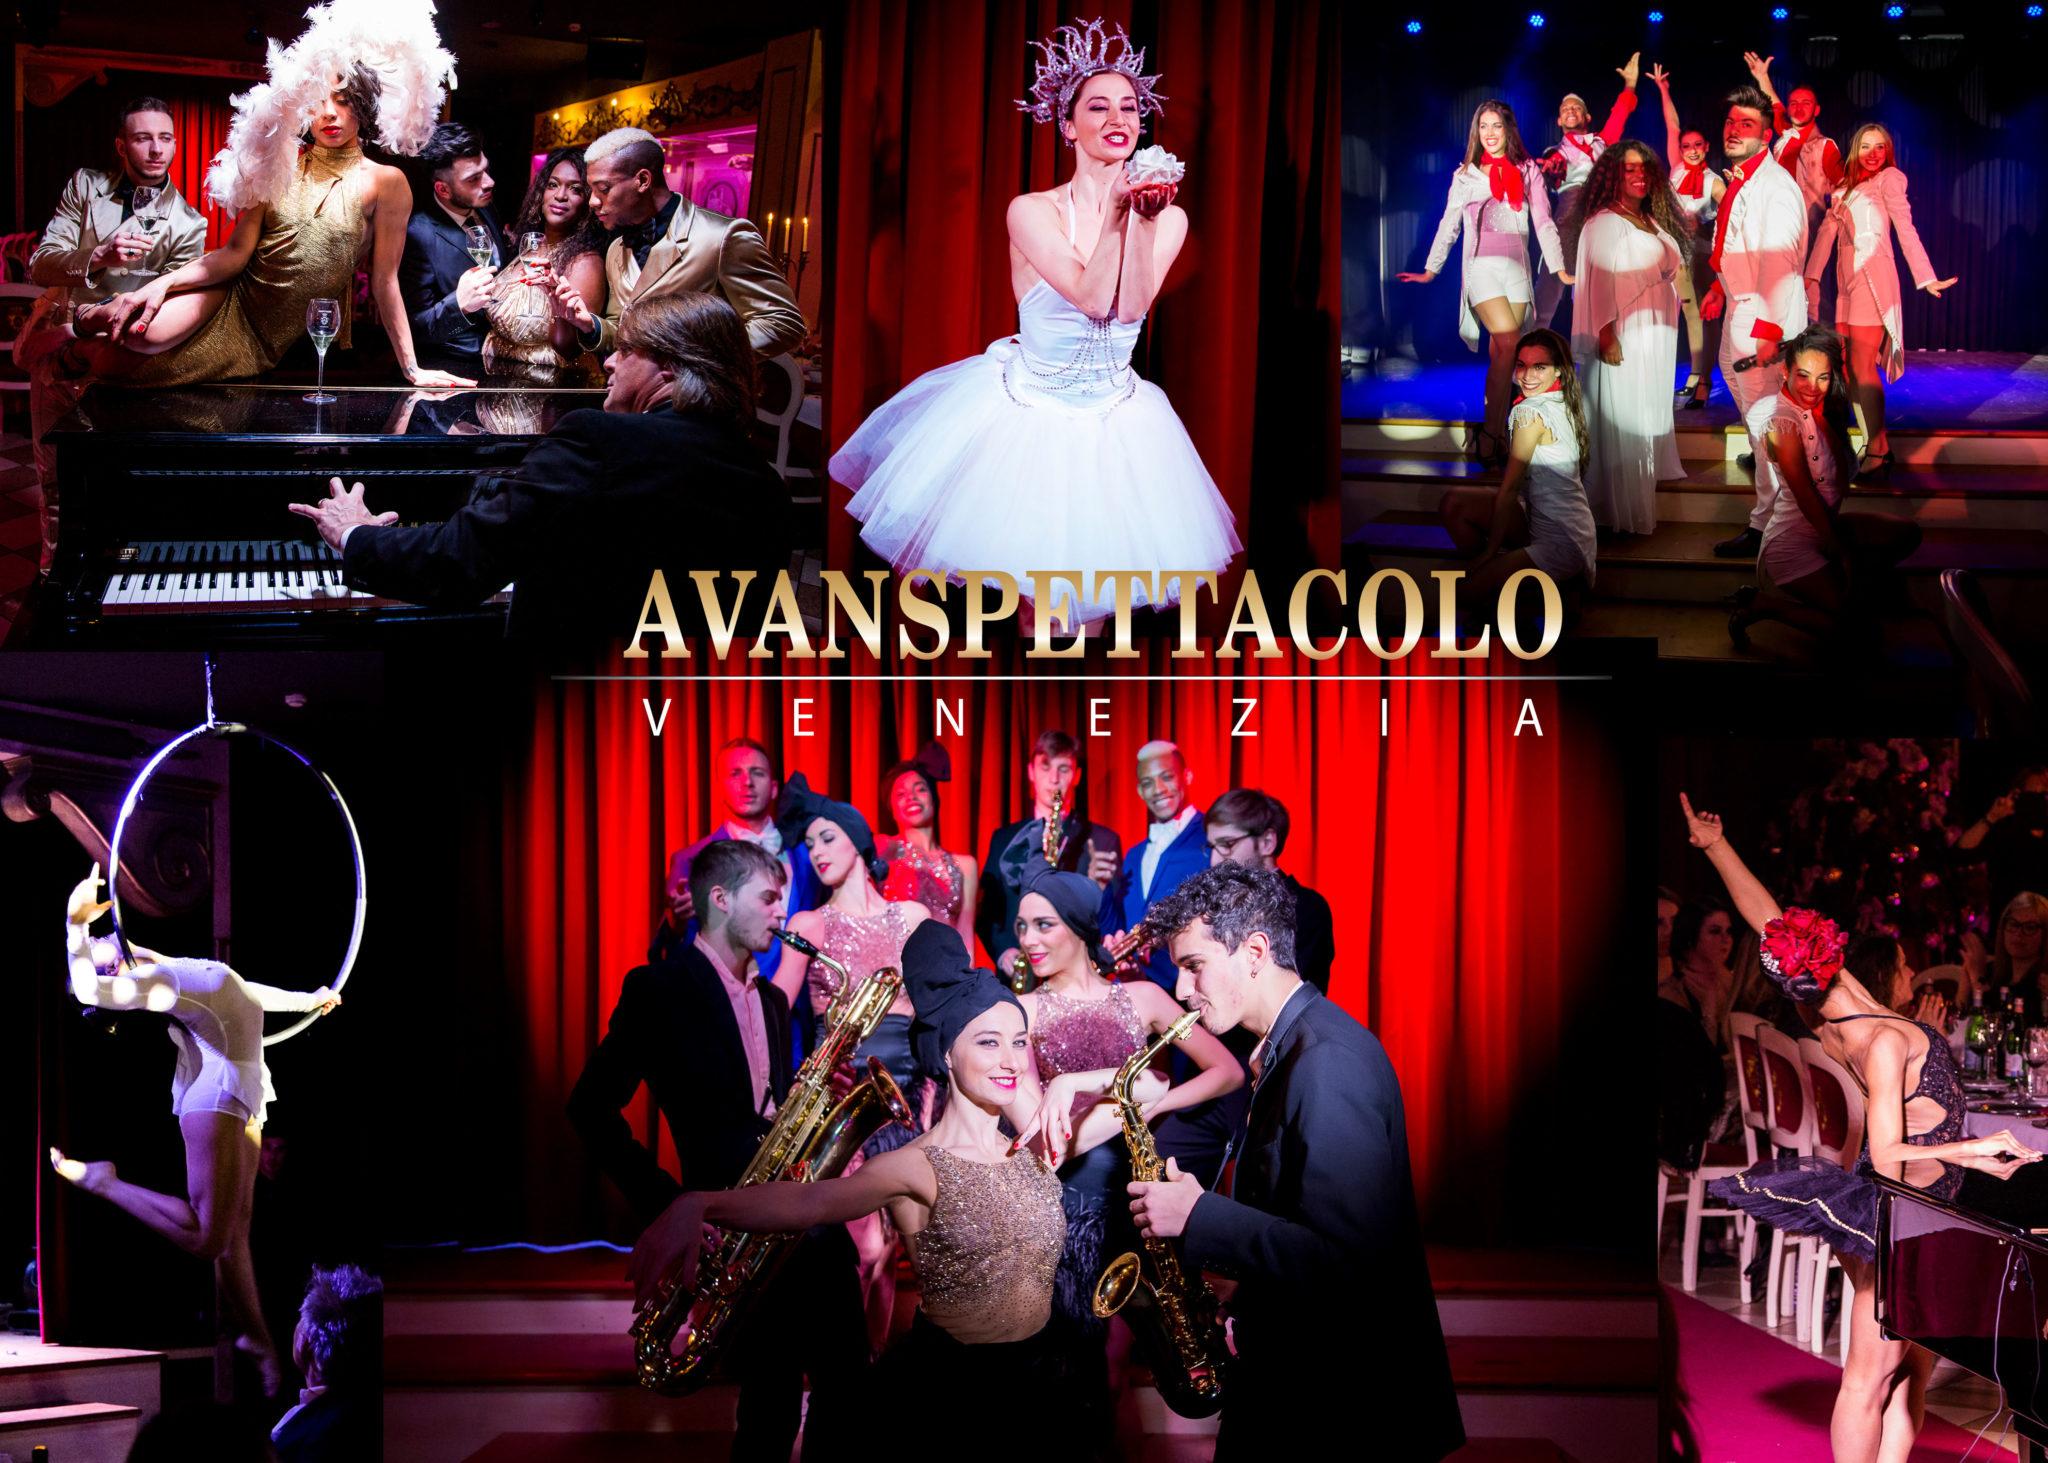 Grand Show Magic Avanspettacolo Venezia 1